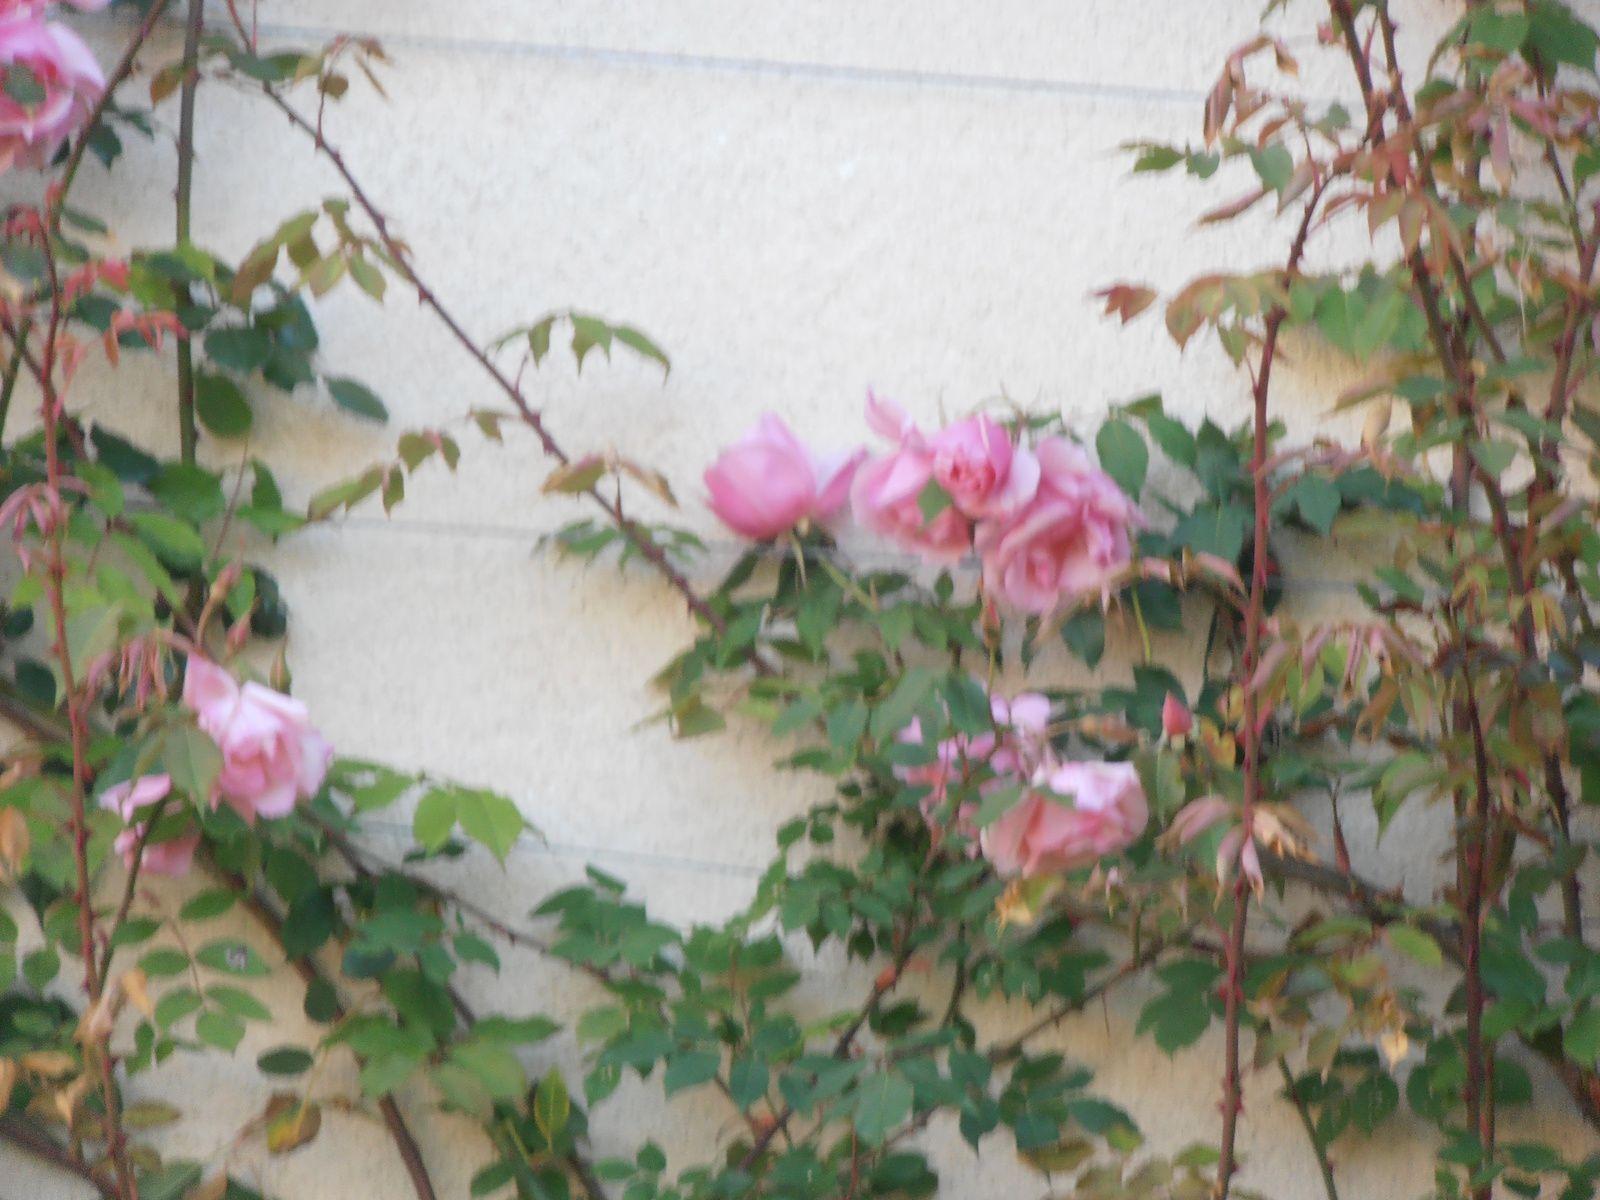 PREMIERES ROSES 2017